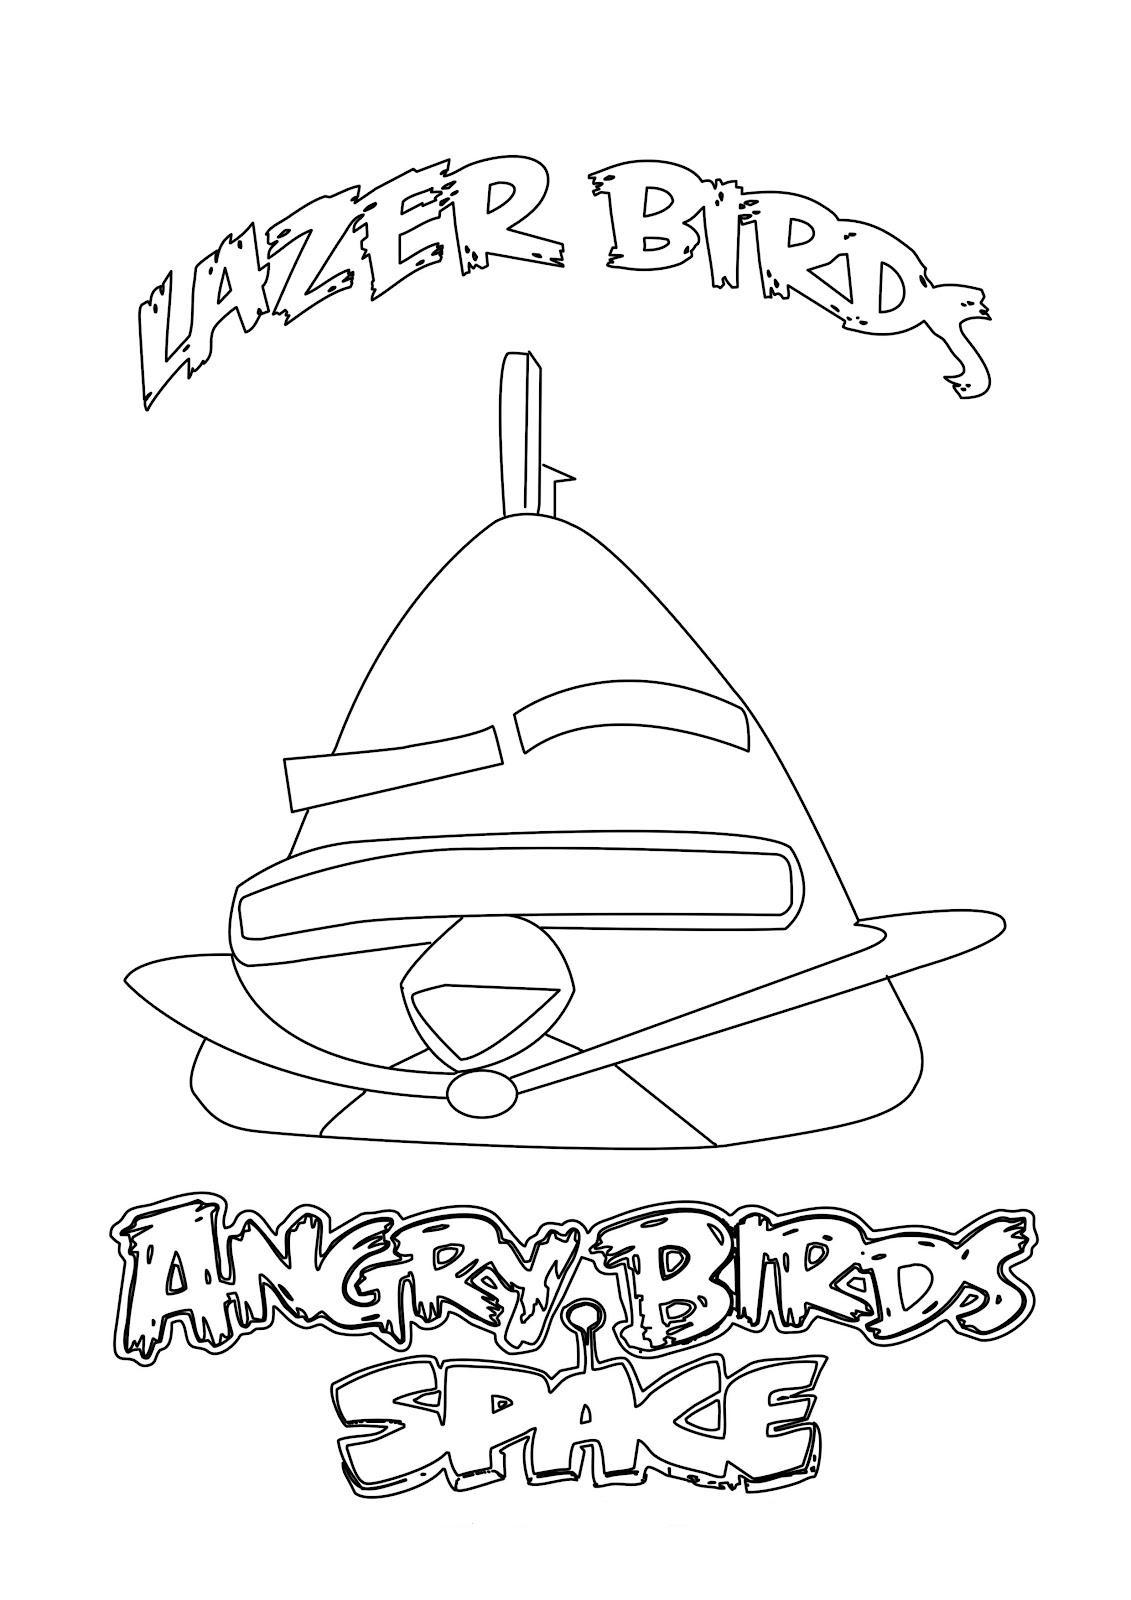 Dibujo para colorear de Angry Birds Space : foto cool de lazer bird